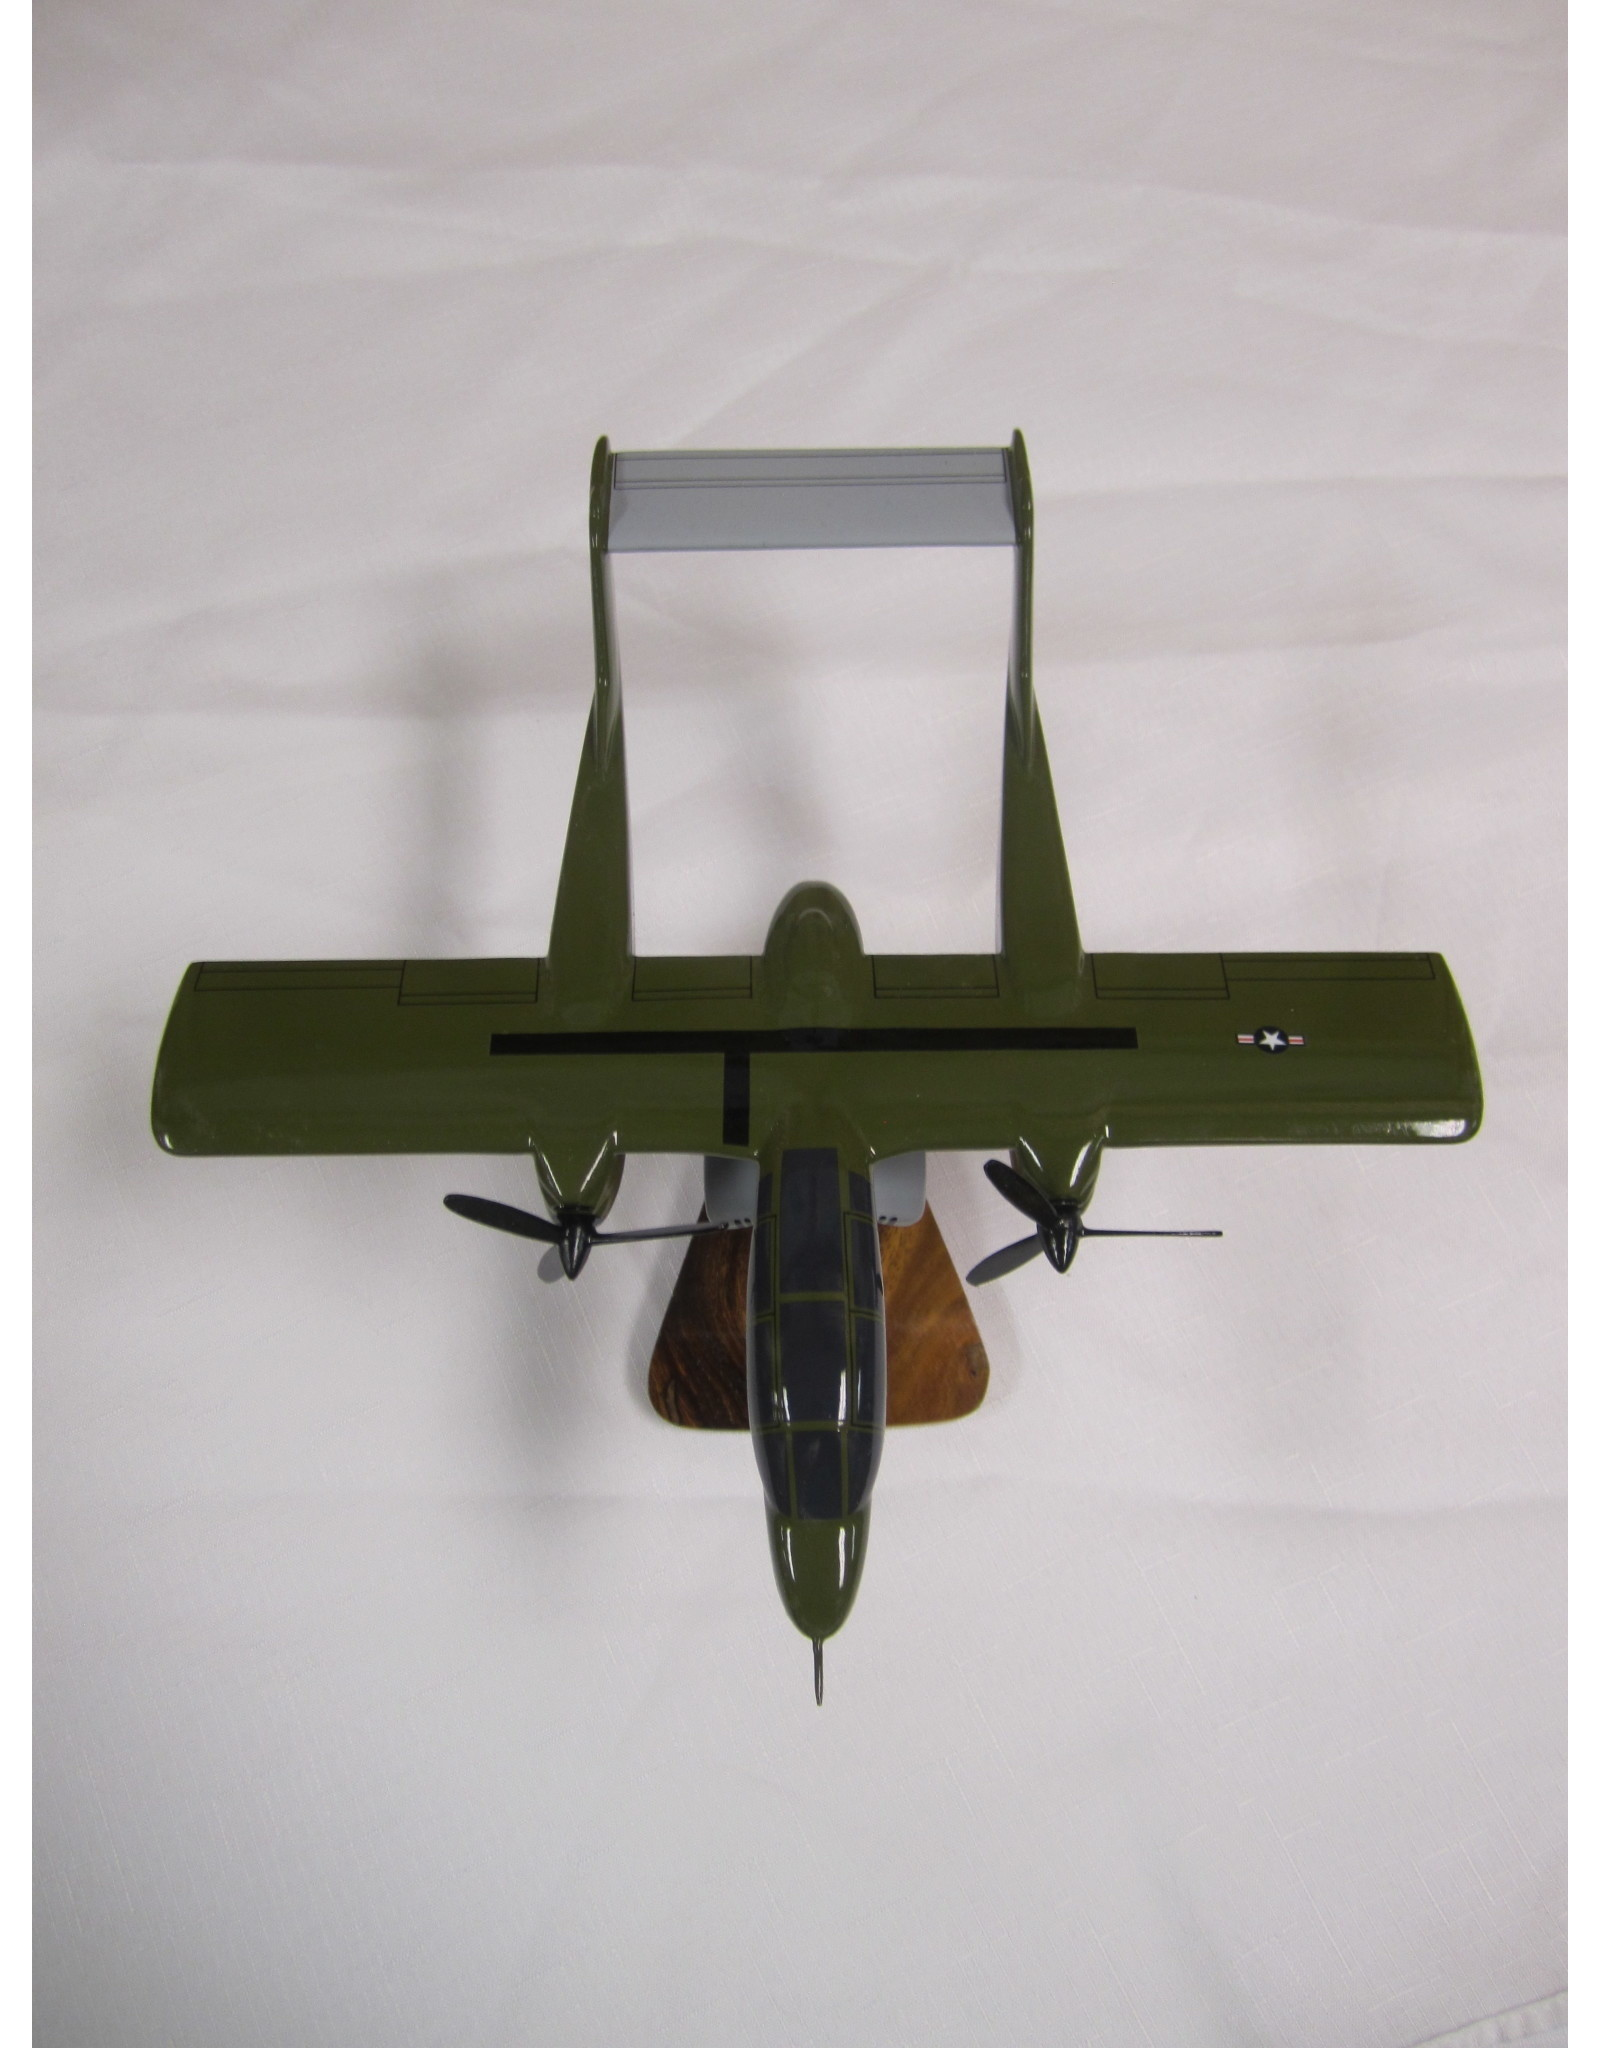 OV-10A Bronco USN Wood Model